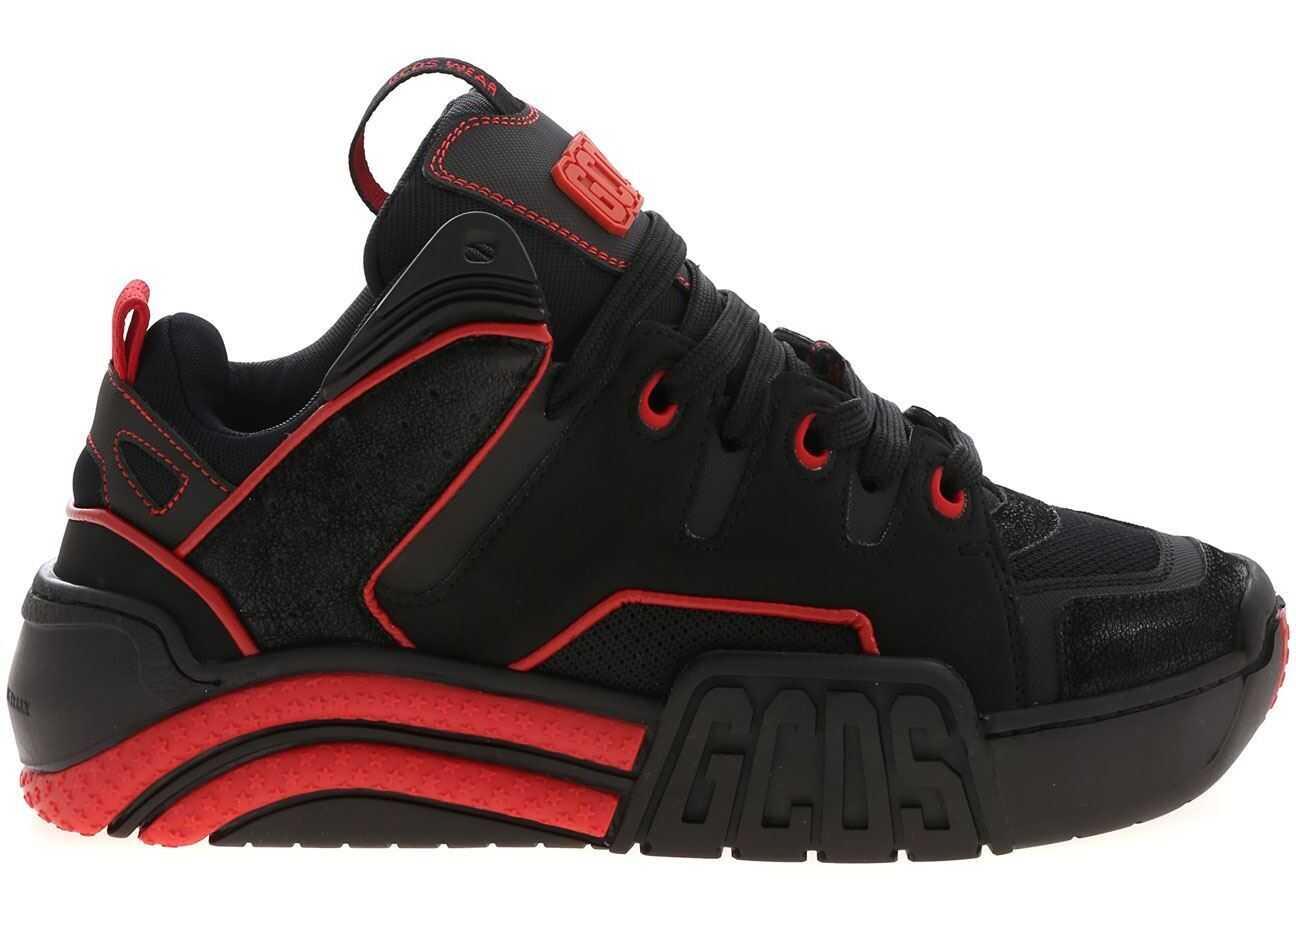 GCDS Skate Big G Sneakers In Black With Logo Black